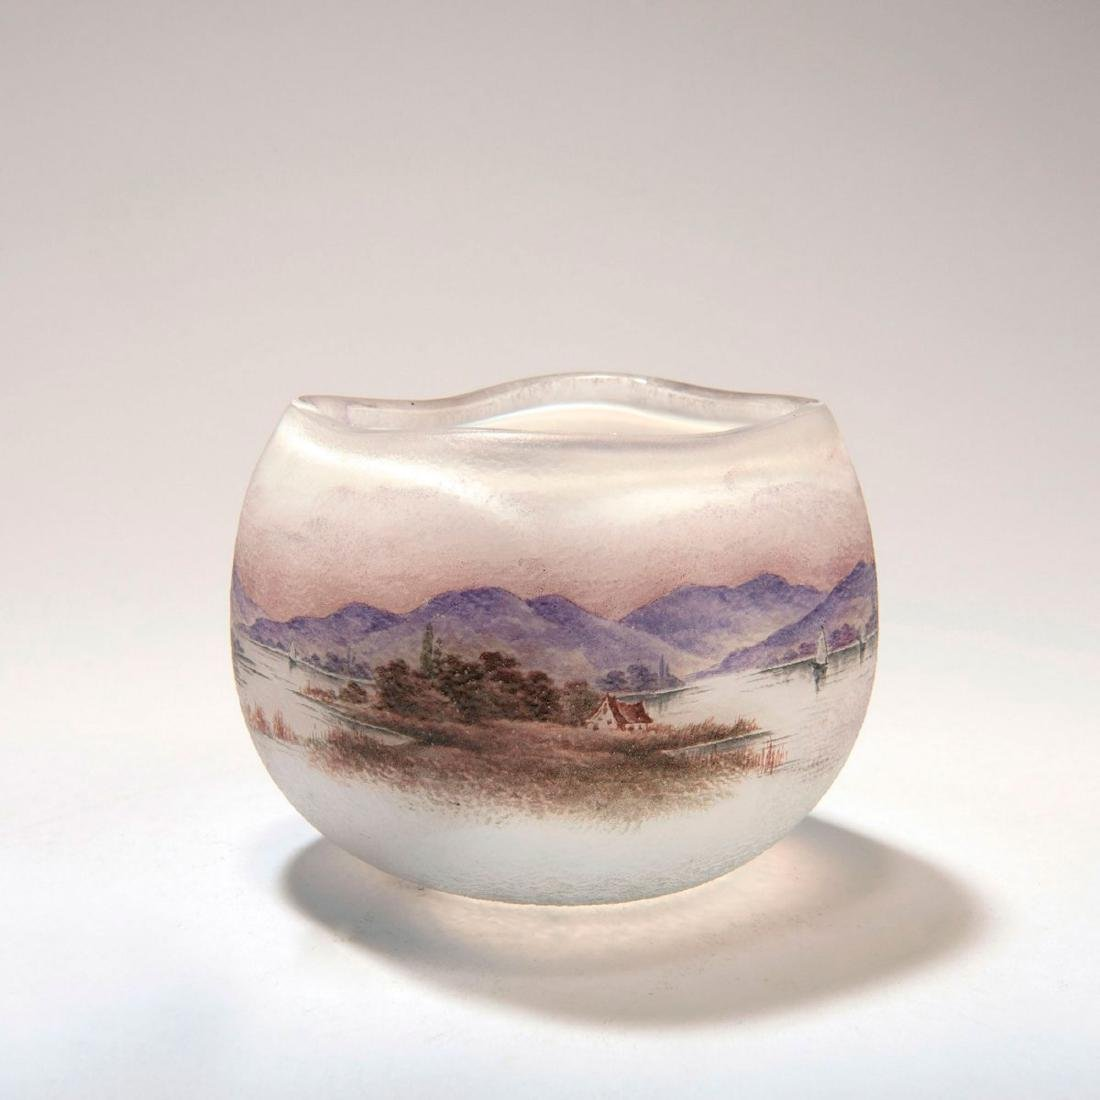 Small 'Paysage vosgien' vase, c. 1905